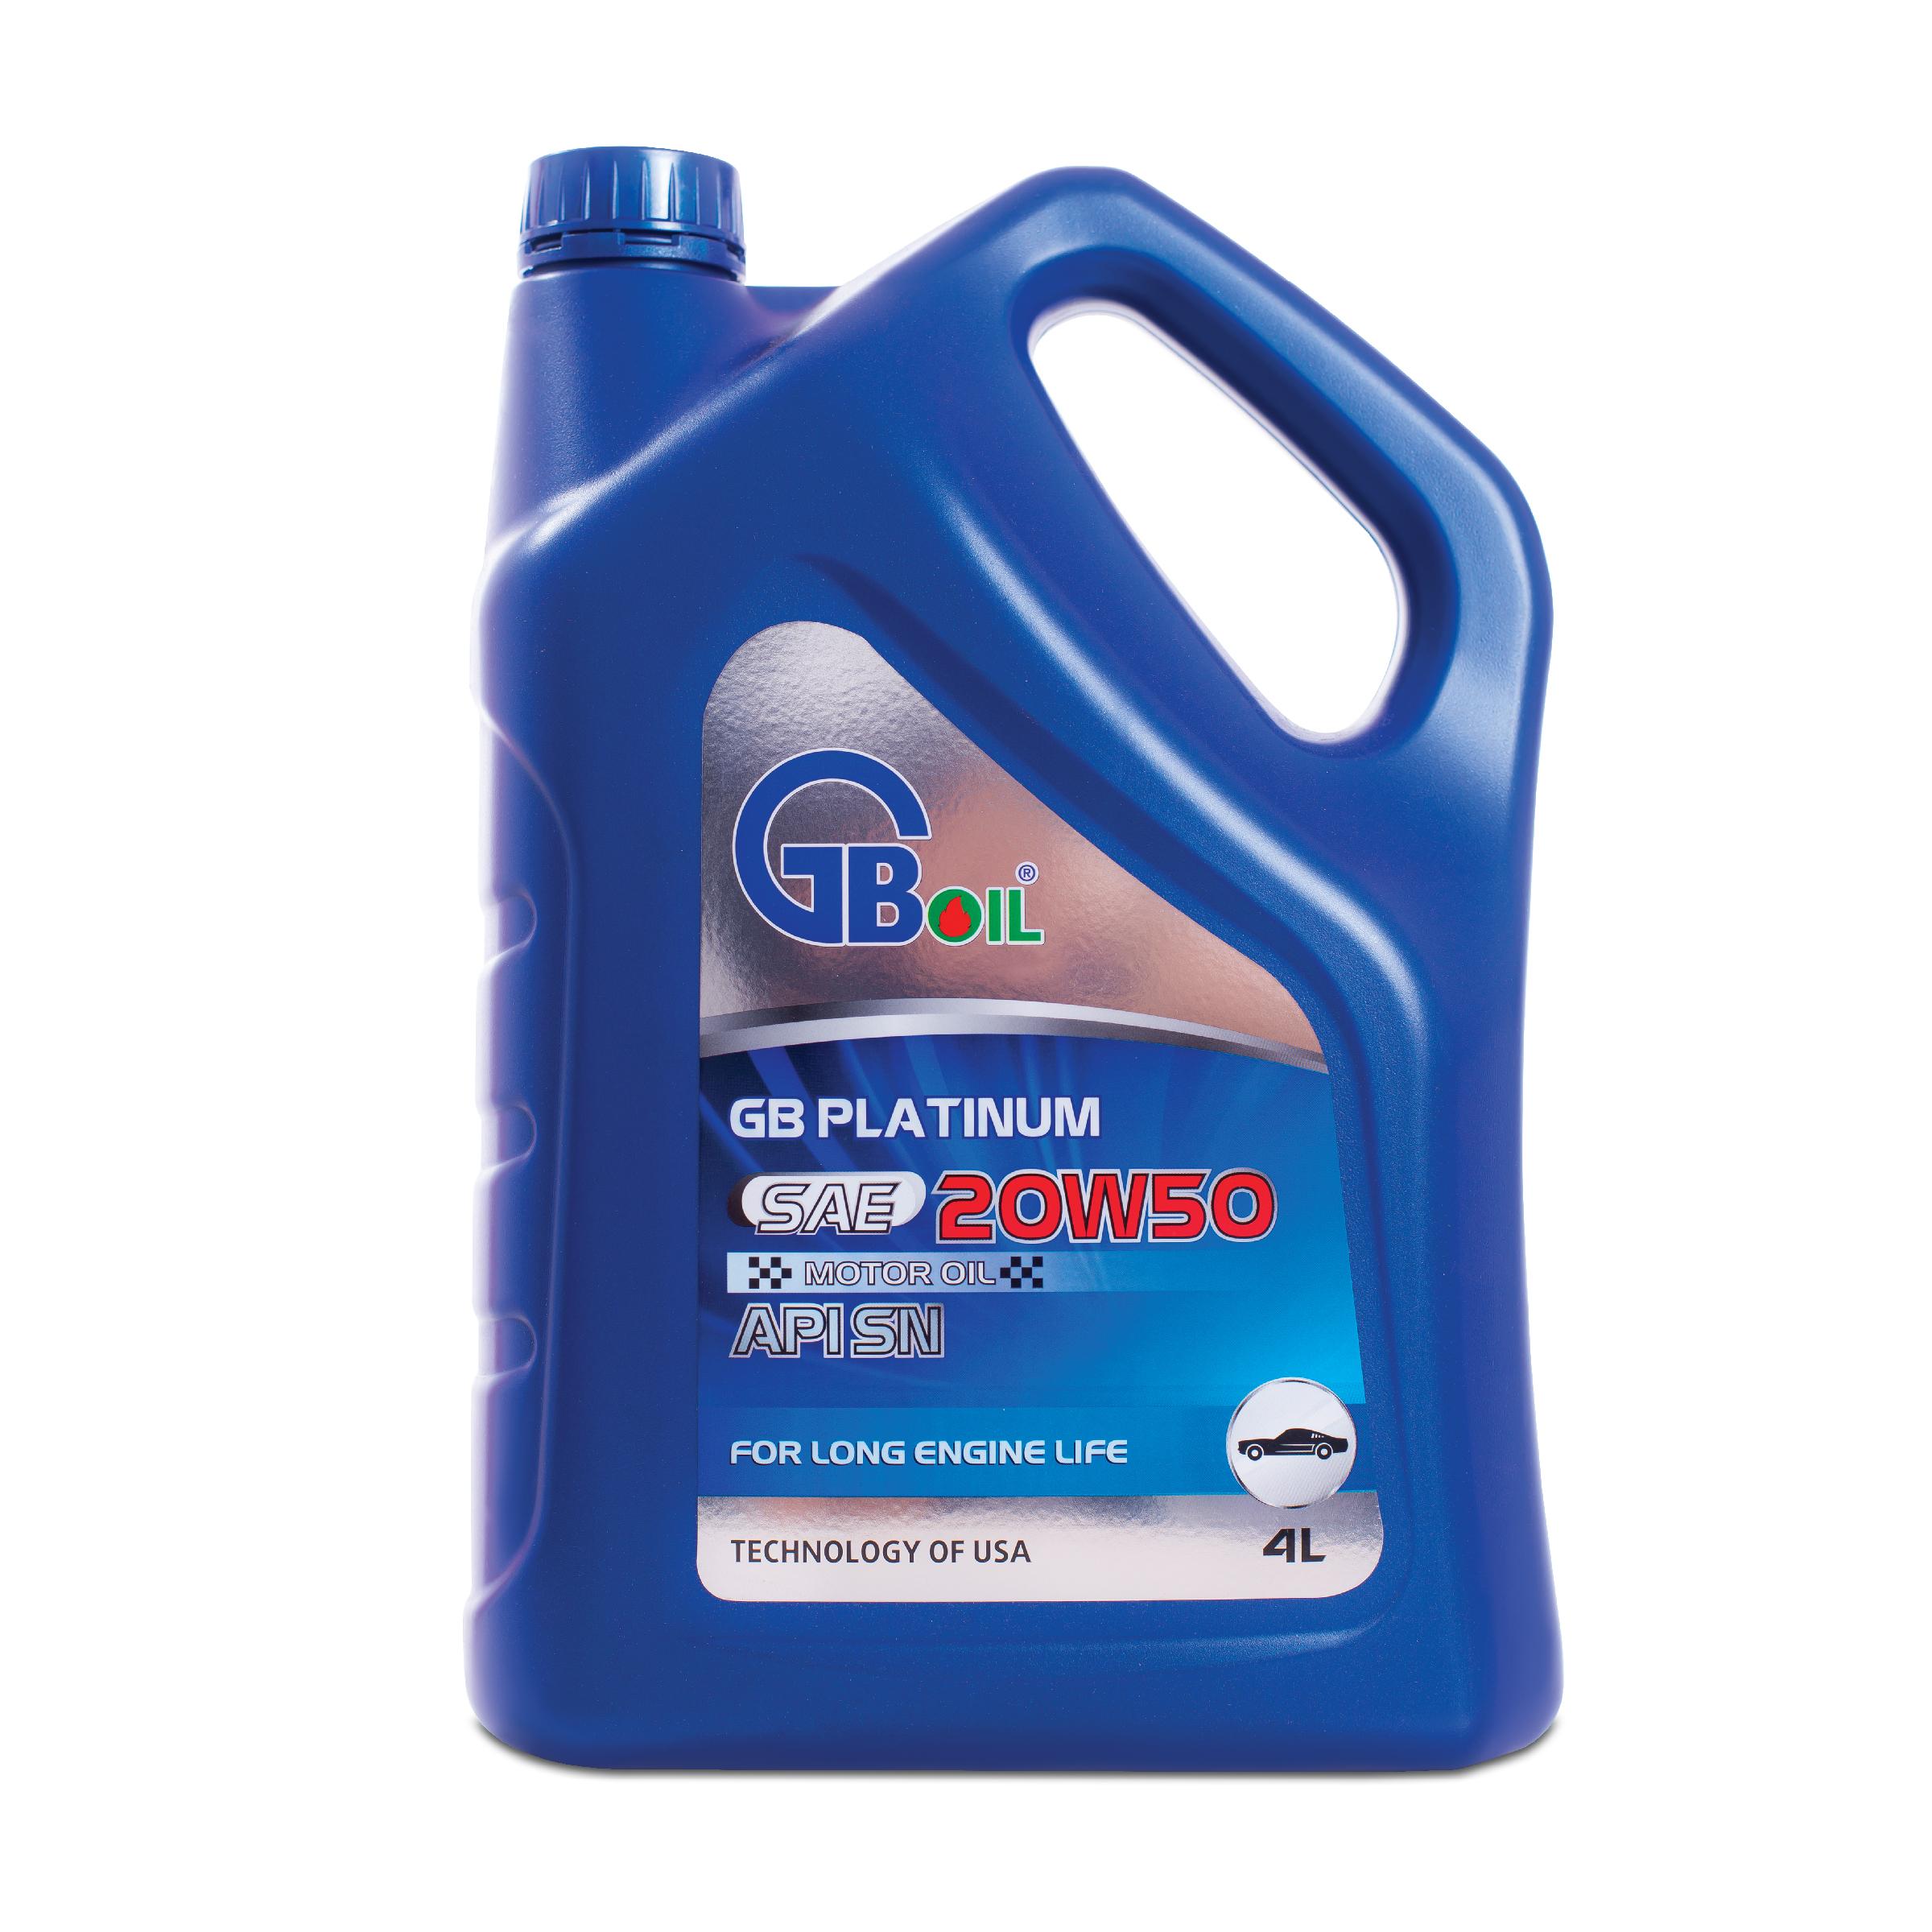 GB Platinum Motor Oil SAE 20W50, API SN